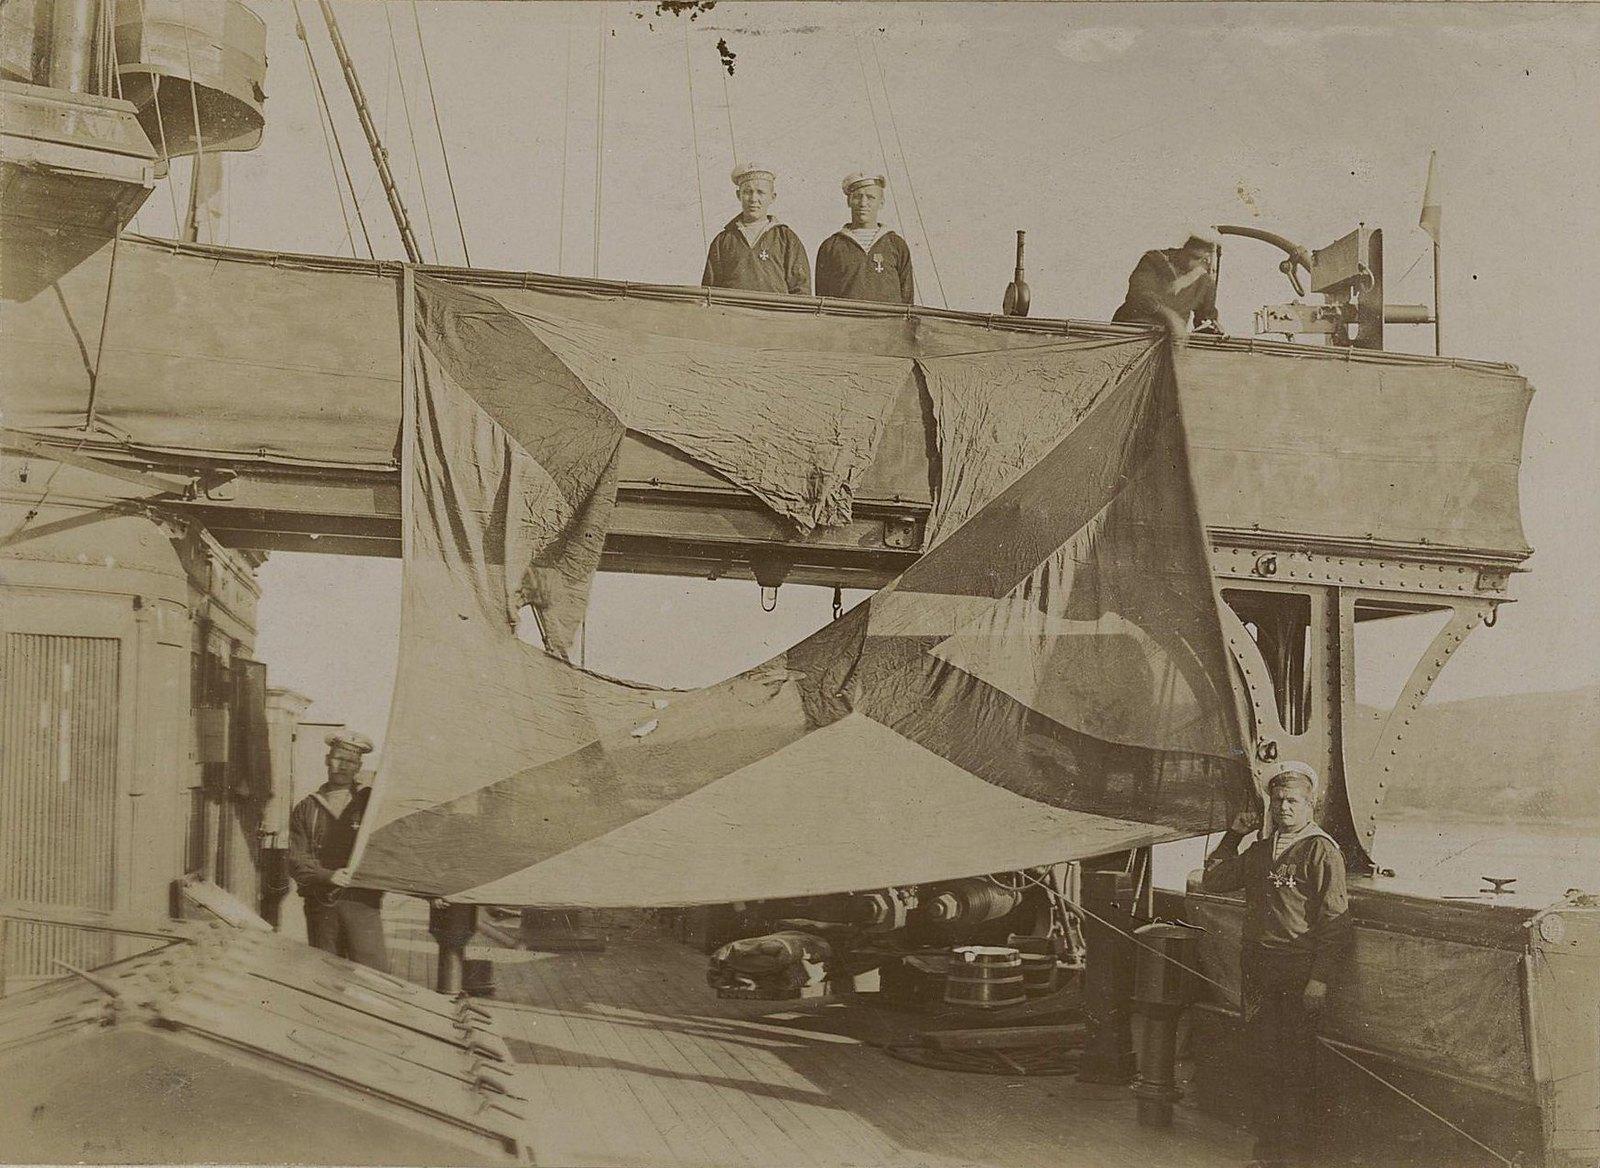 Матросы растягивают порванный флаг над палубой корабля. 1905 г.